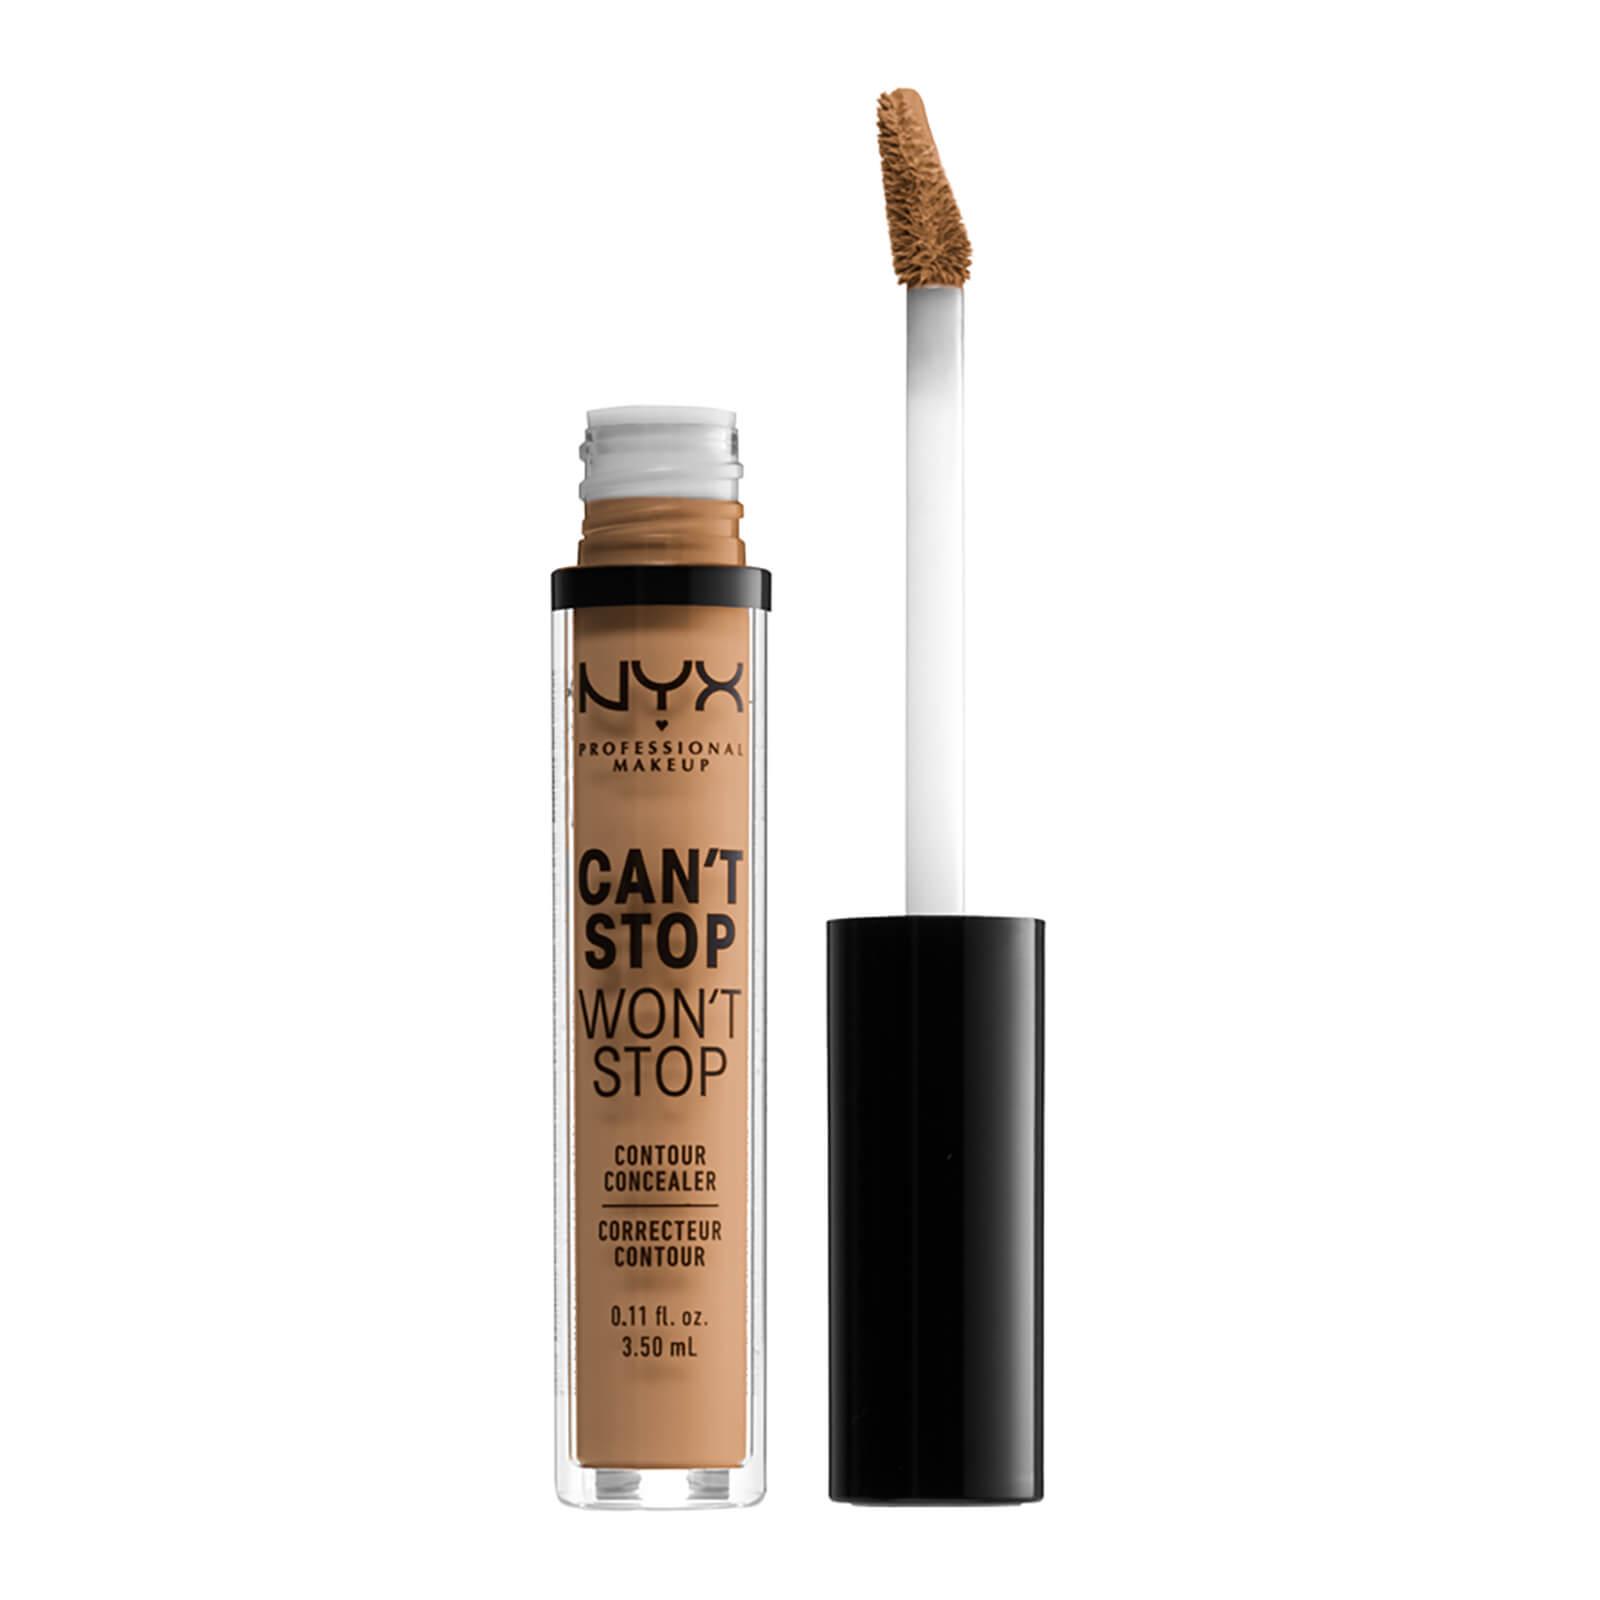 NYX Professional Makeup Can't Stop Won't Stop Contour Concealer (Various Shades) - Golden Honey